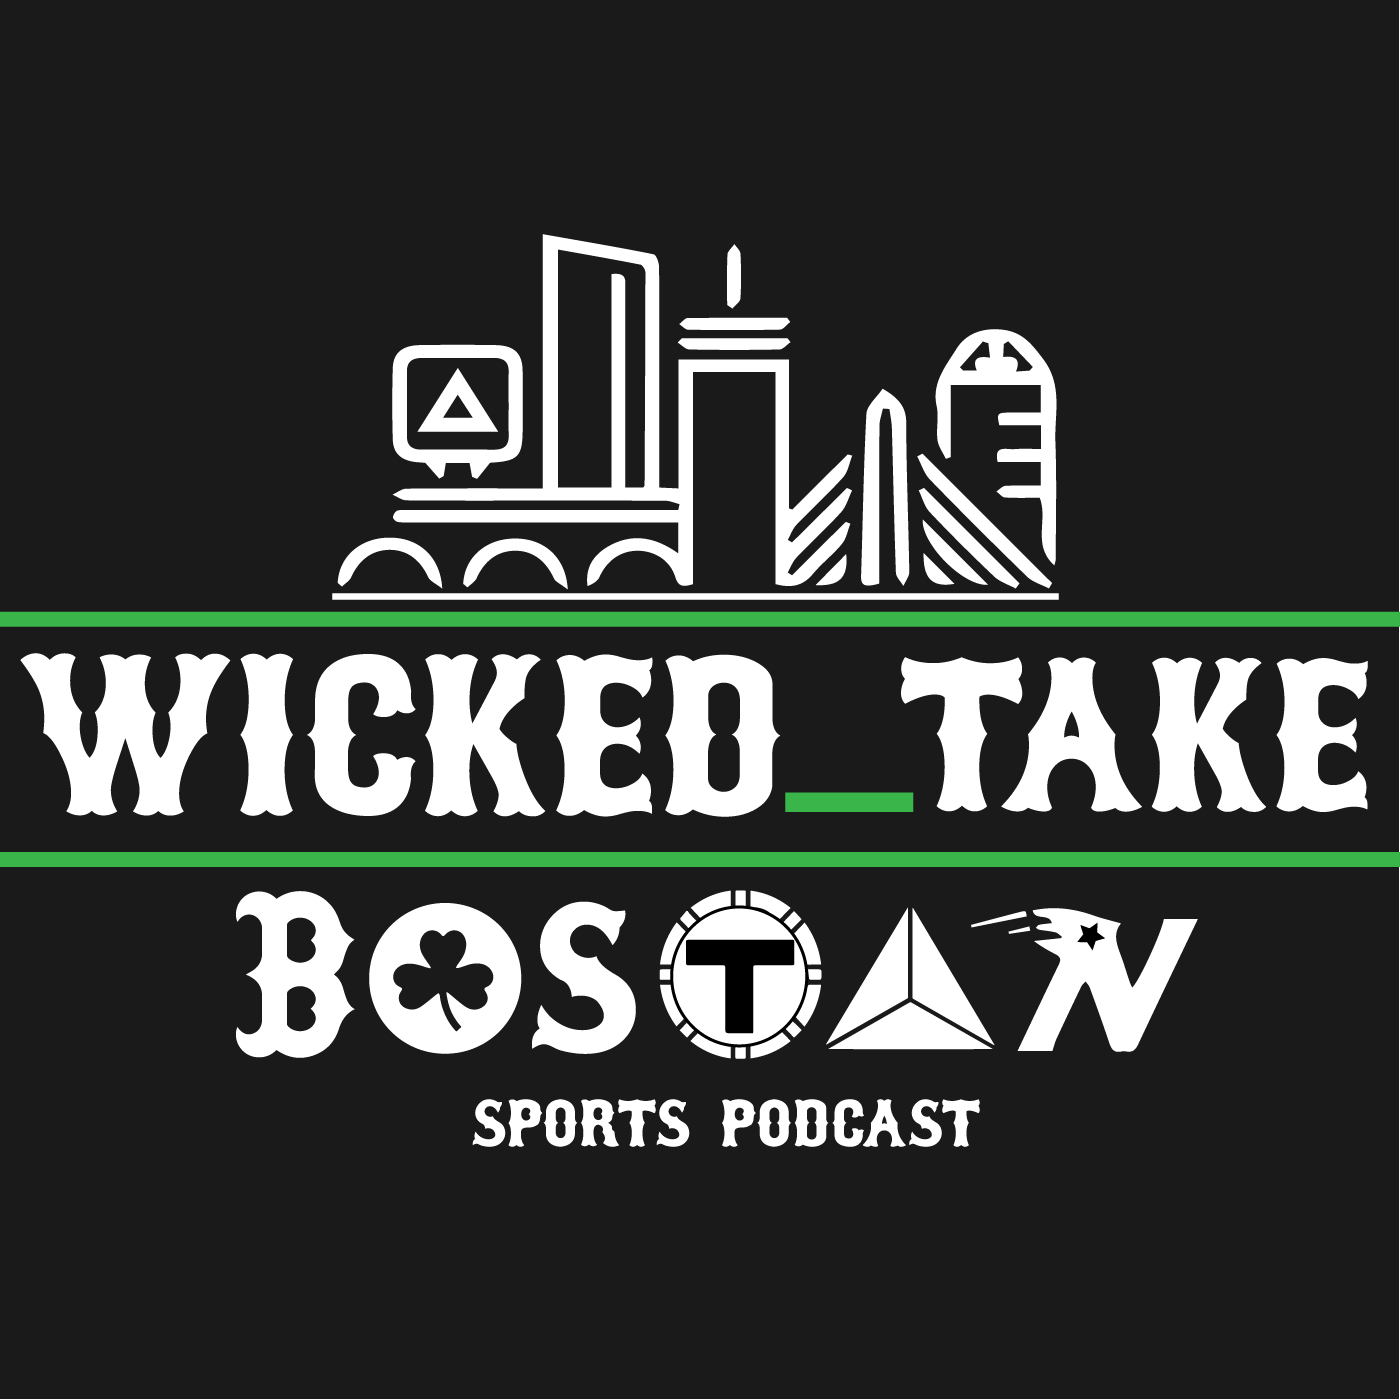 New-Podcast-Design